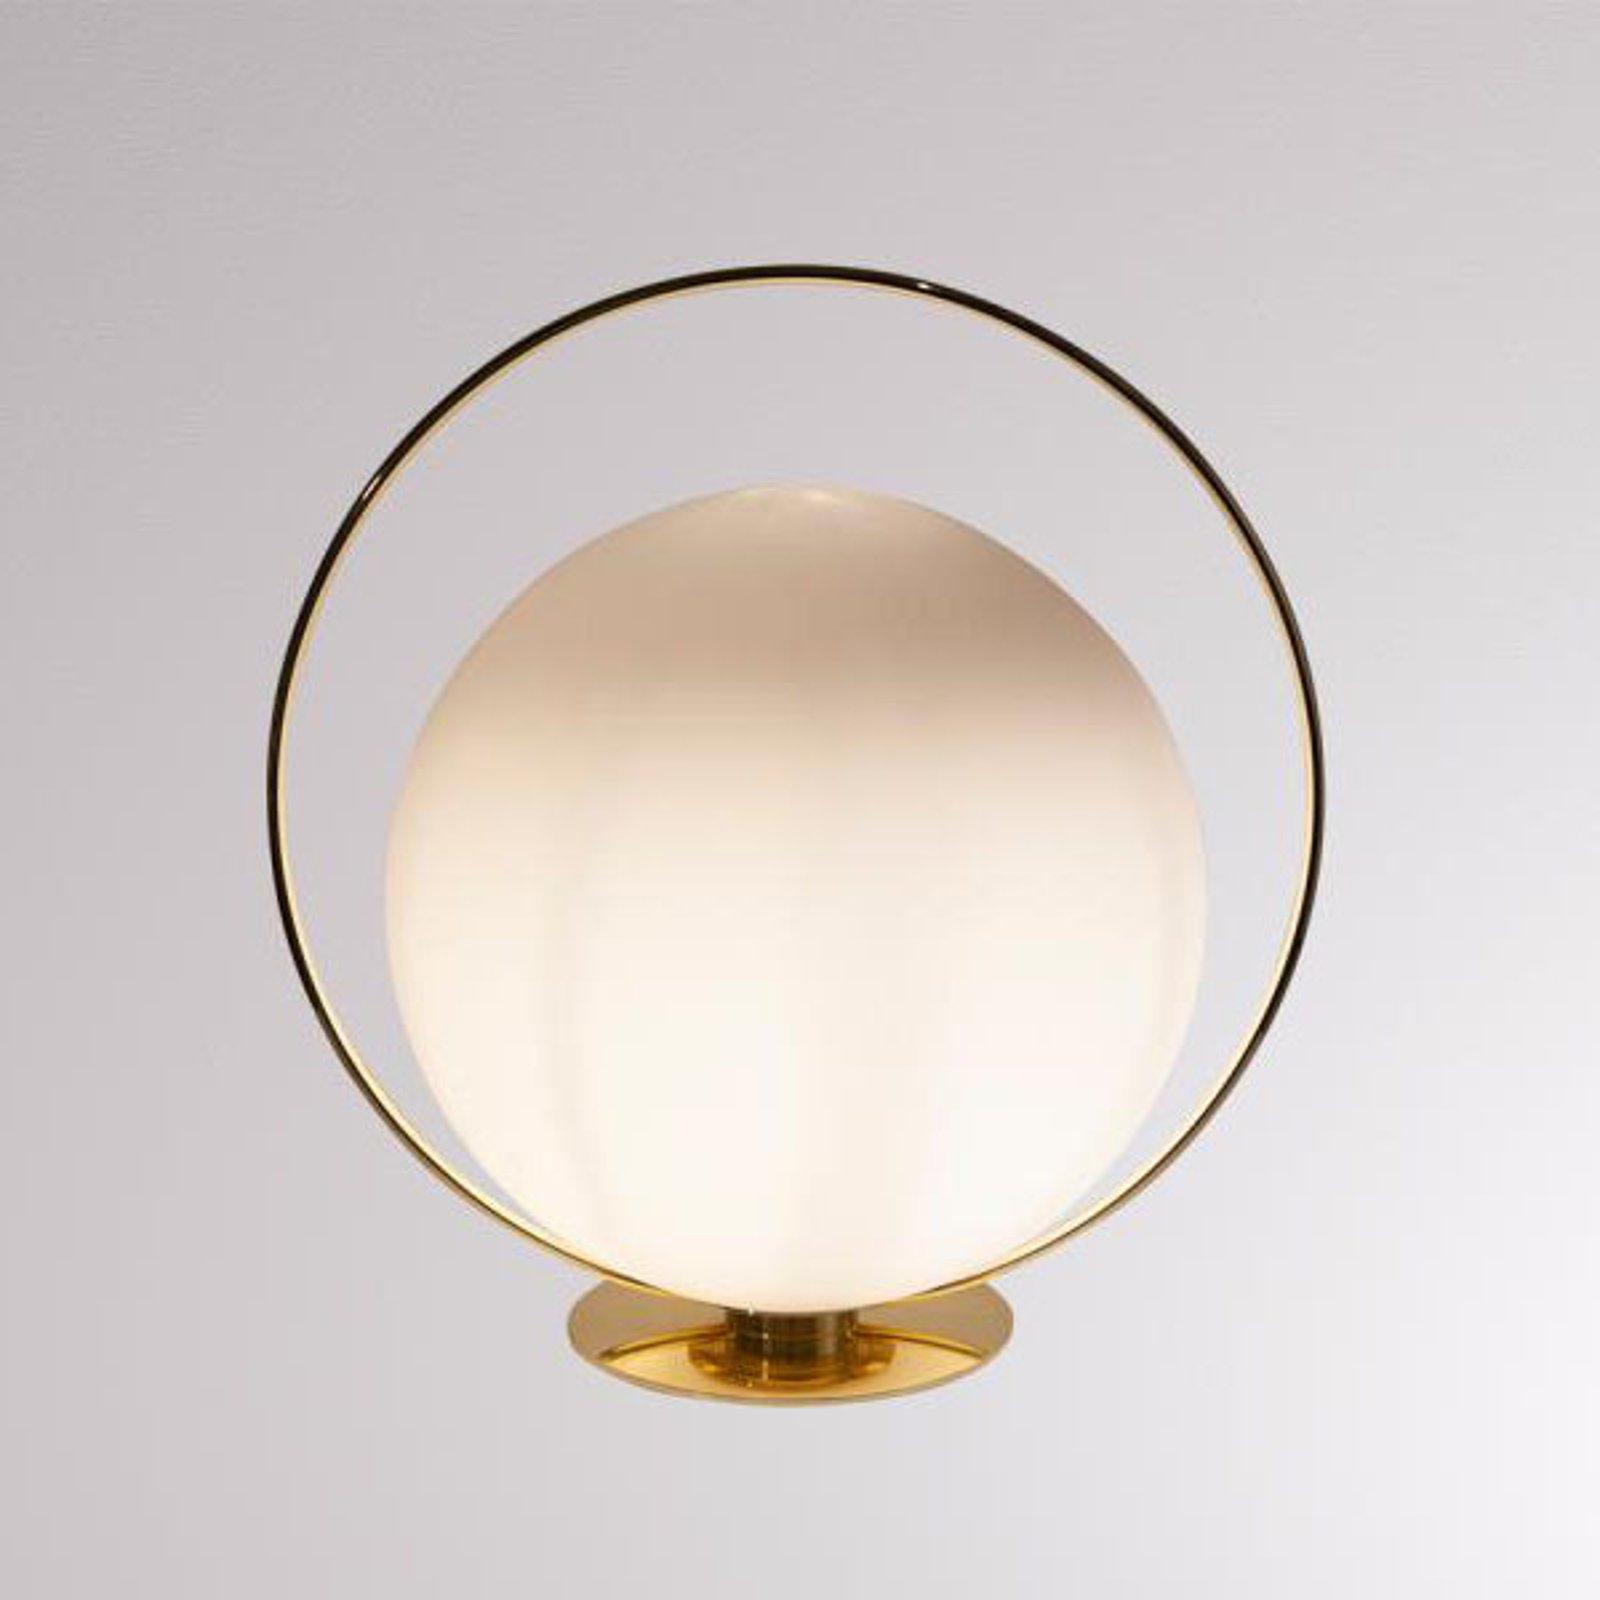 LOUM Tycho bordlampe med messigfarget ring